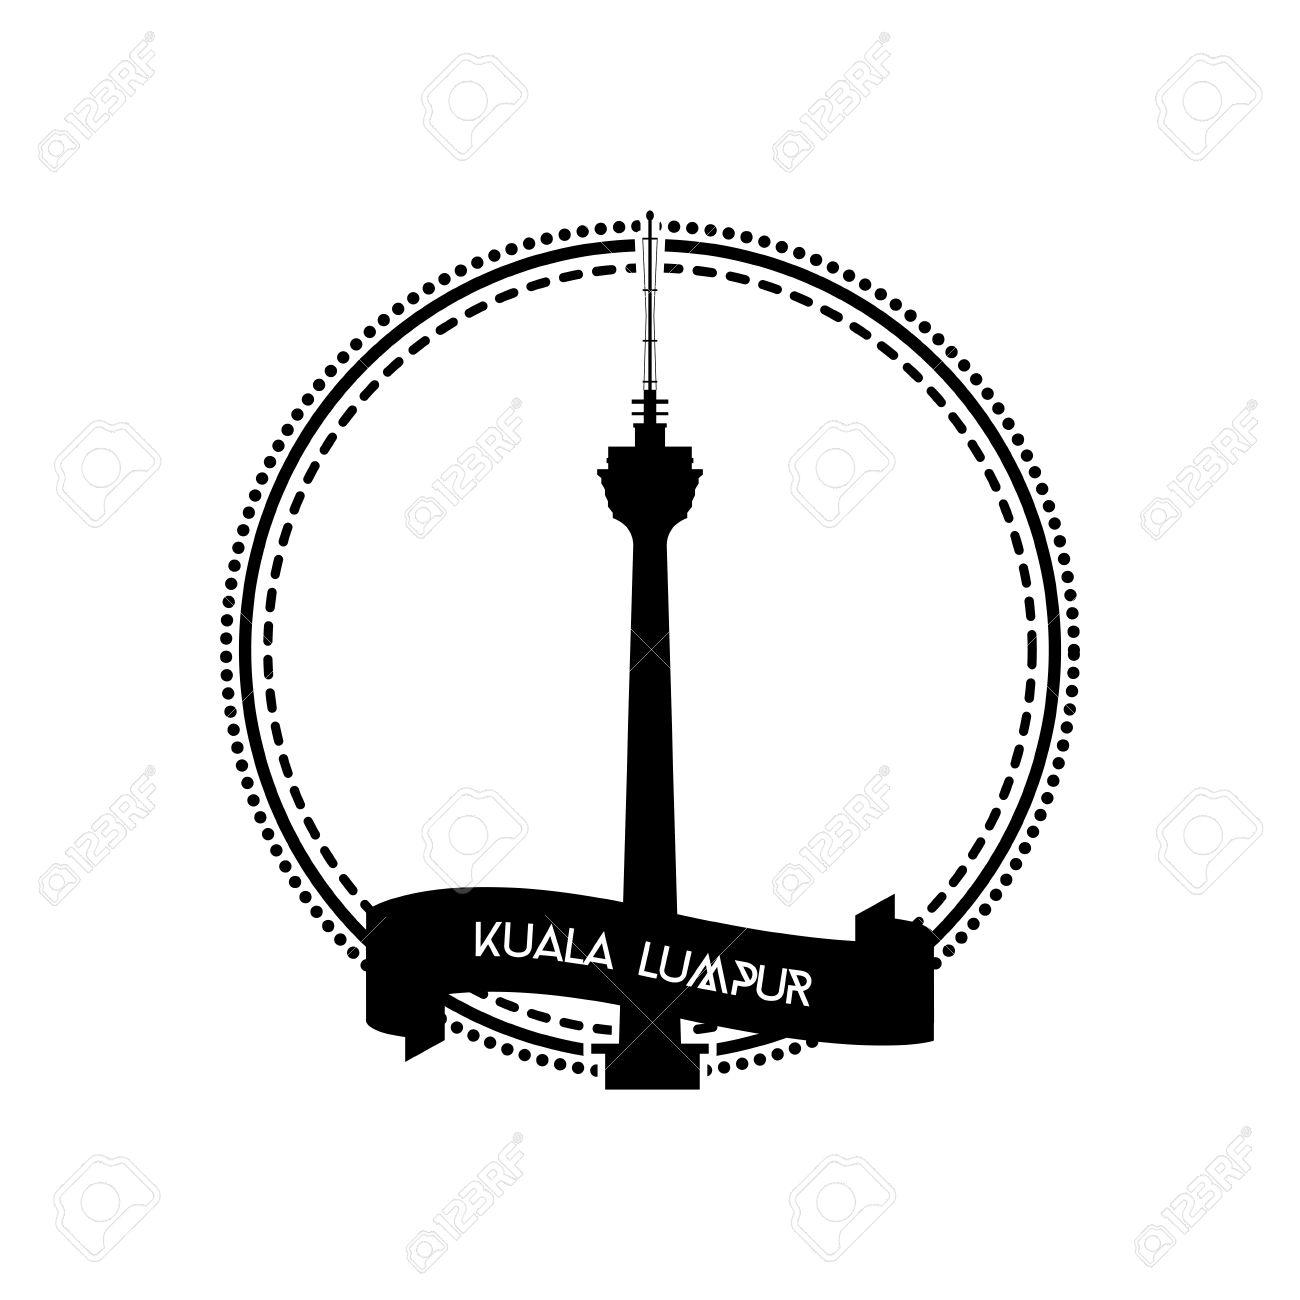 Menara Kl Clipart.